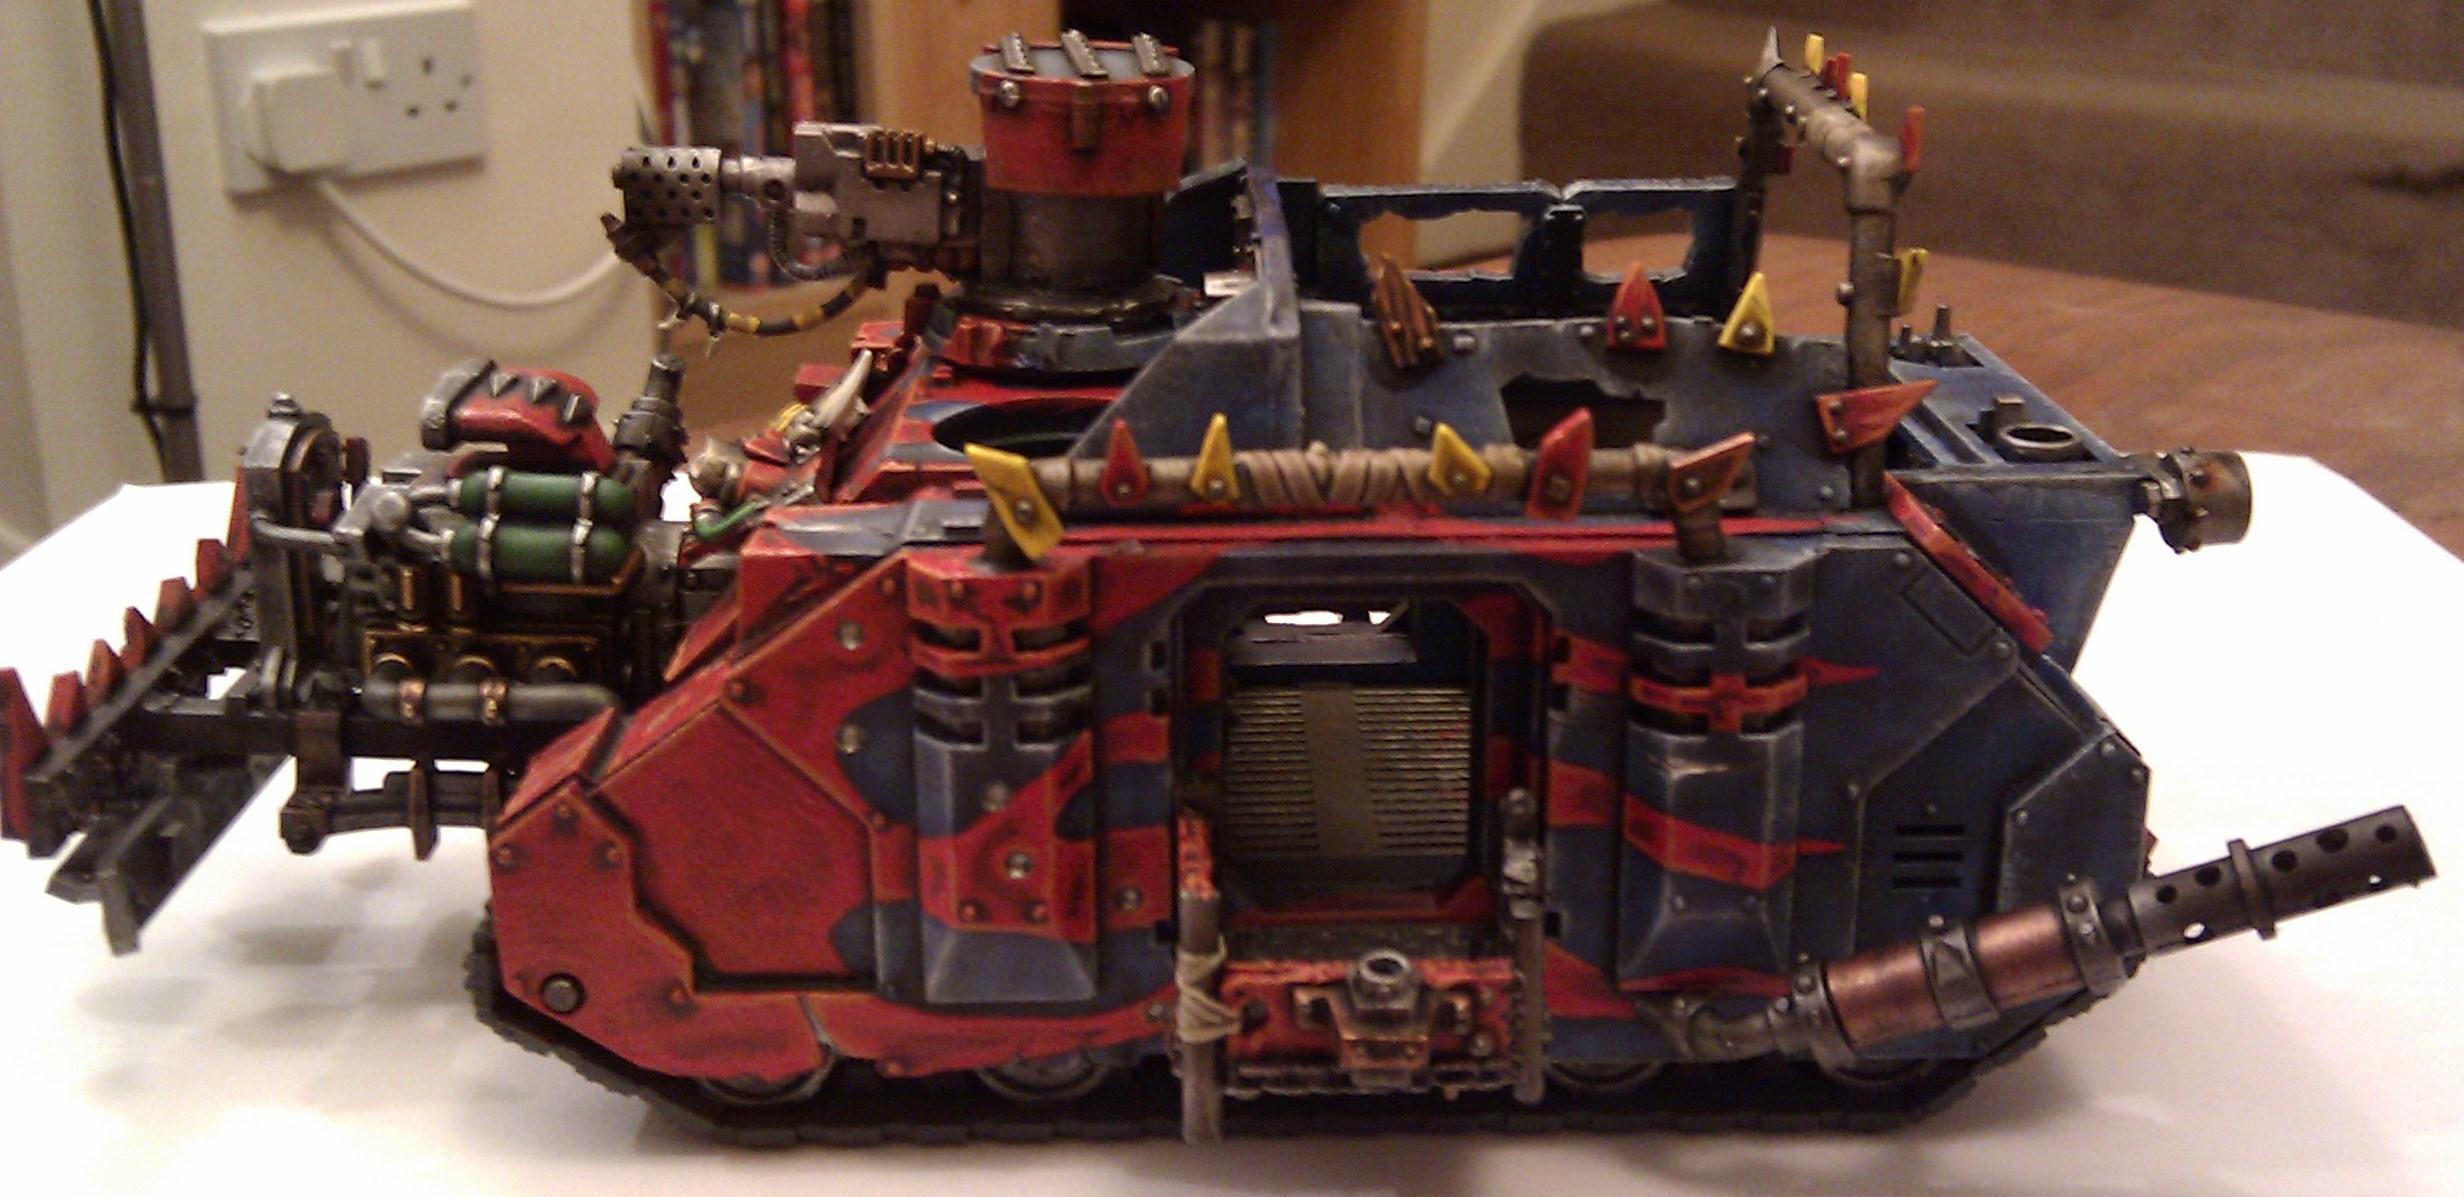 Conversion, Looted Wagon, Mekboy Junka, Orks, Rhino, Work In Progress